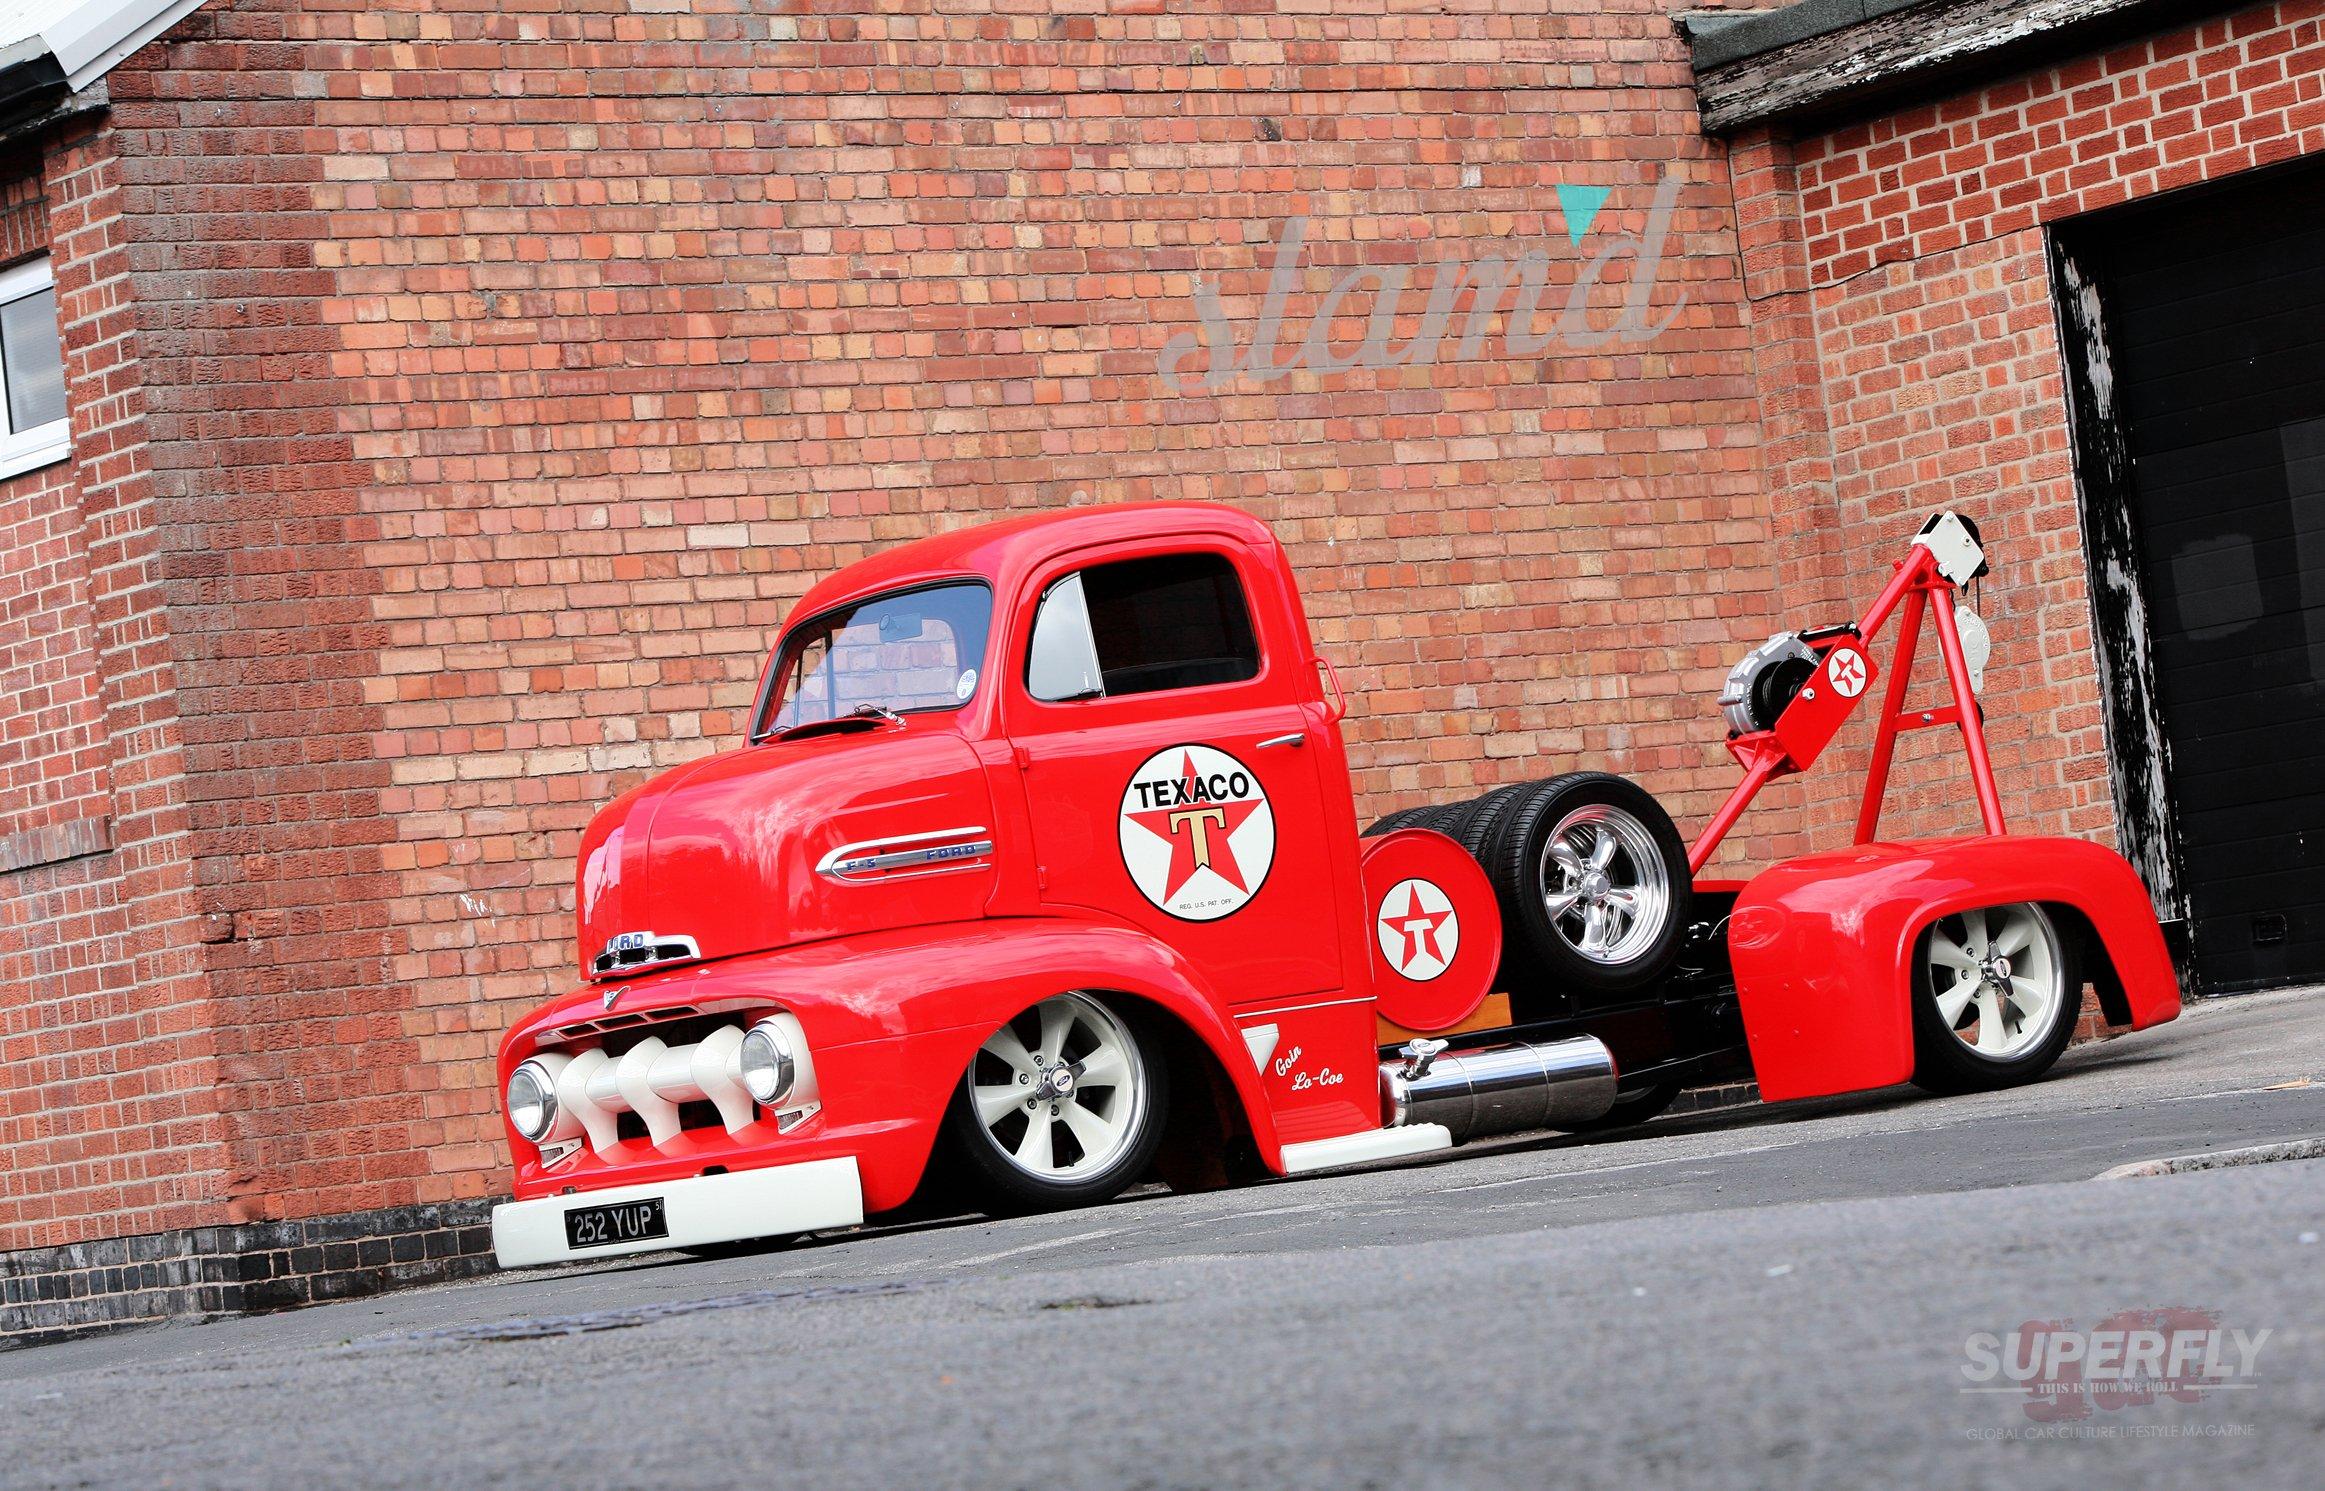 Classic Jdm Cars And Trucks